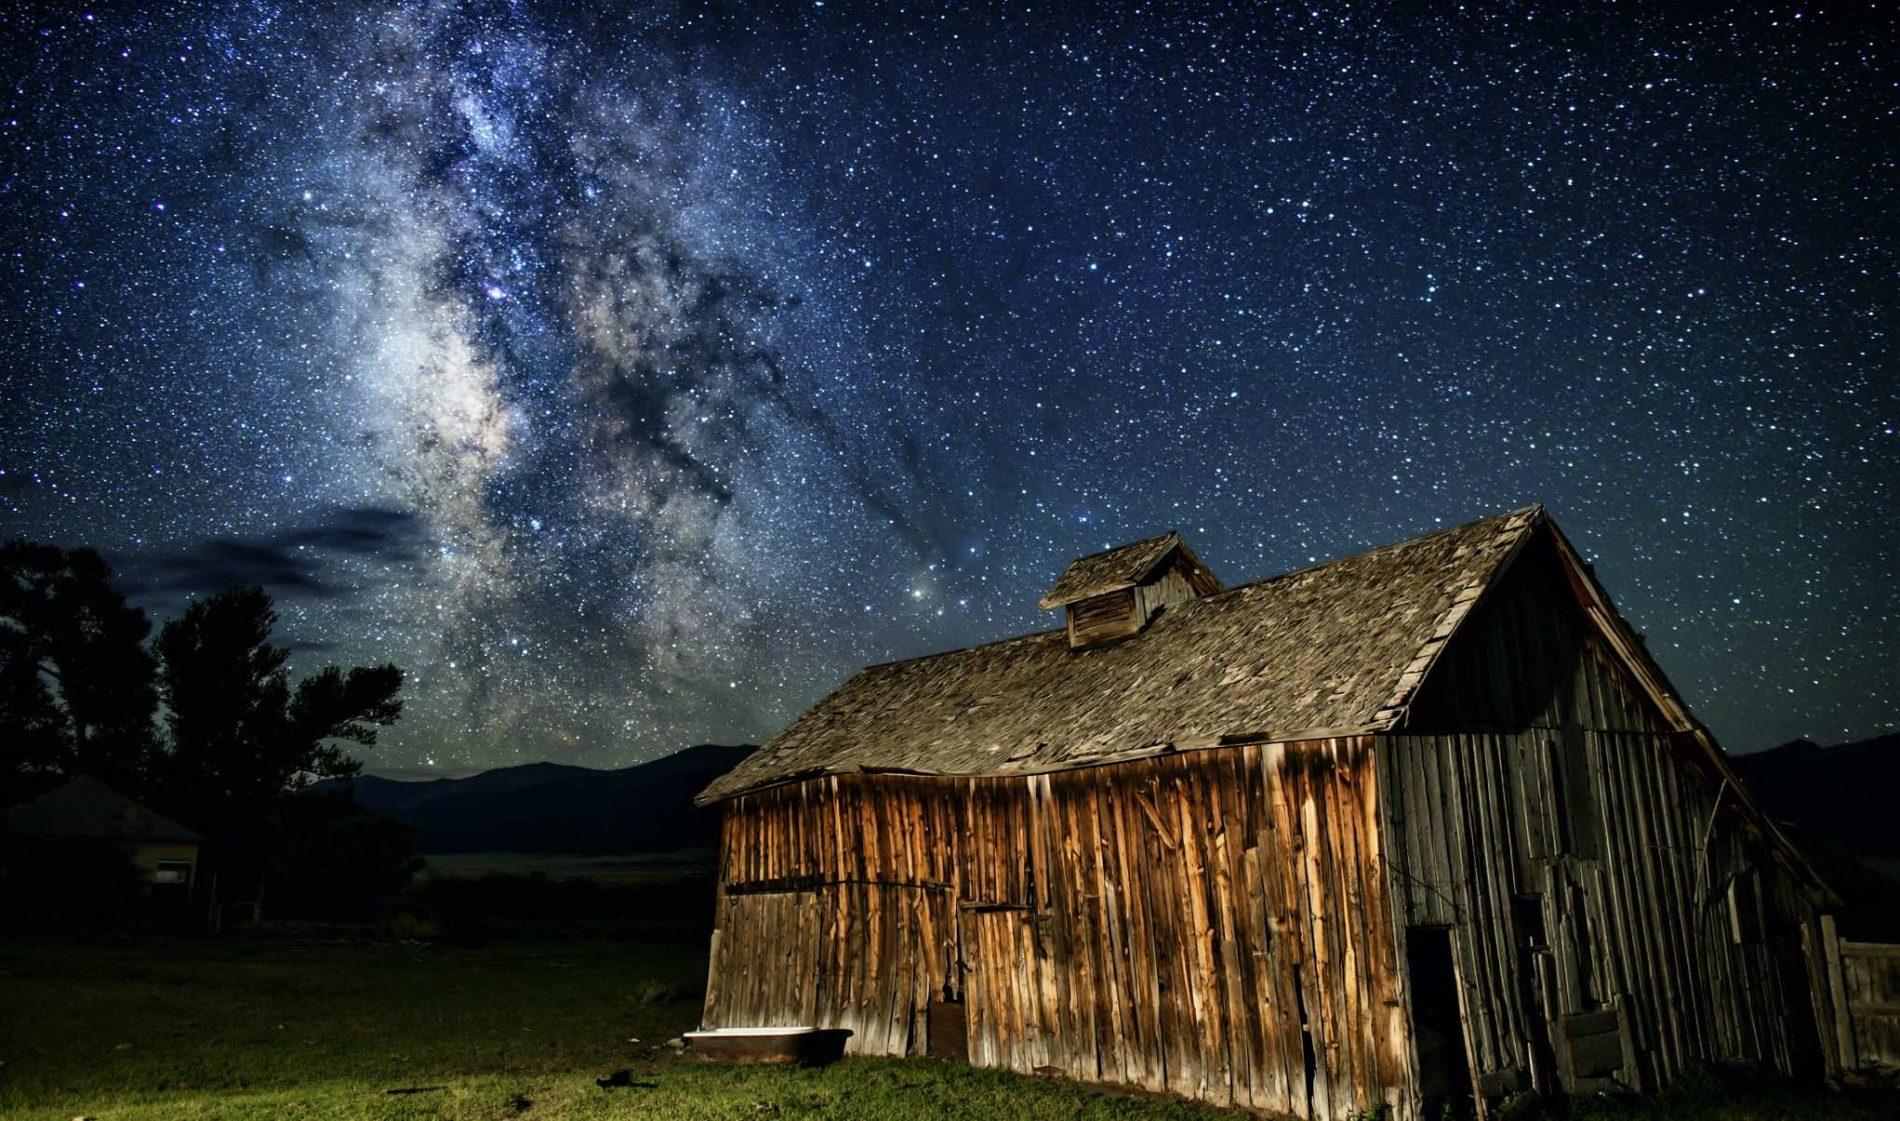 Stargazing Benefits